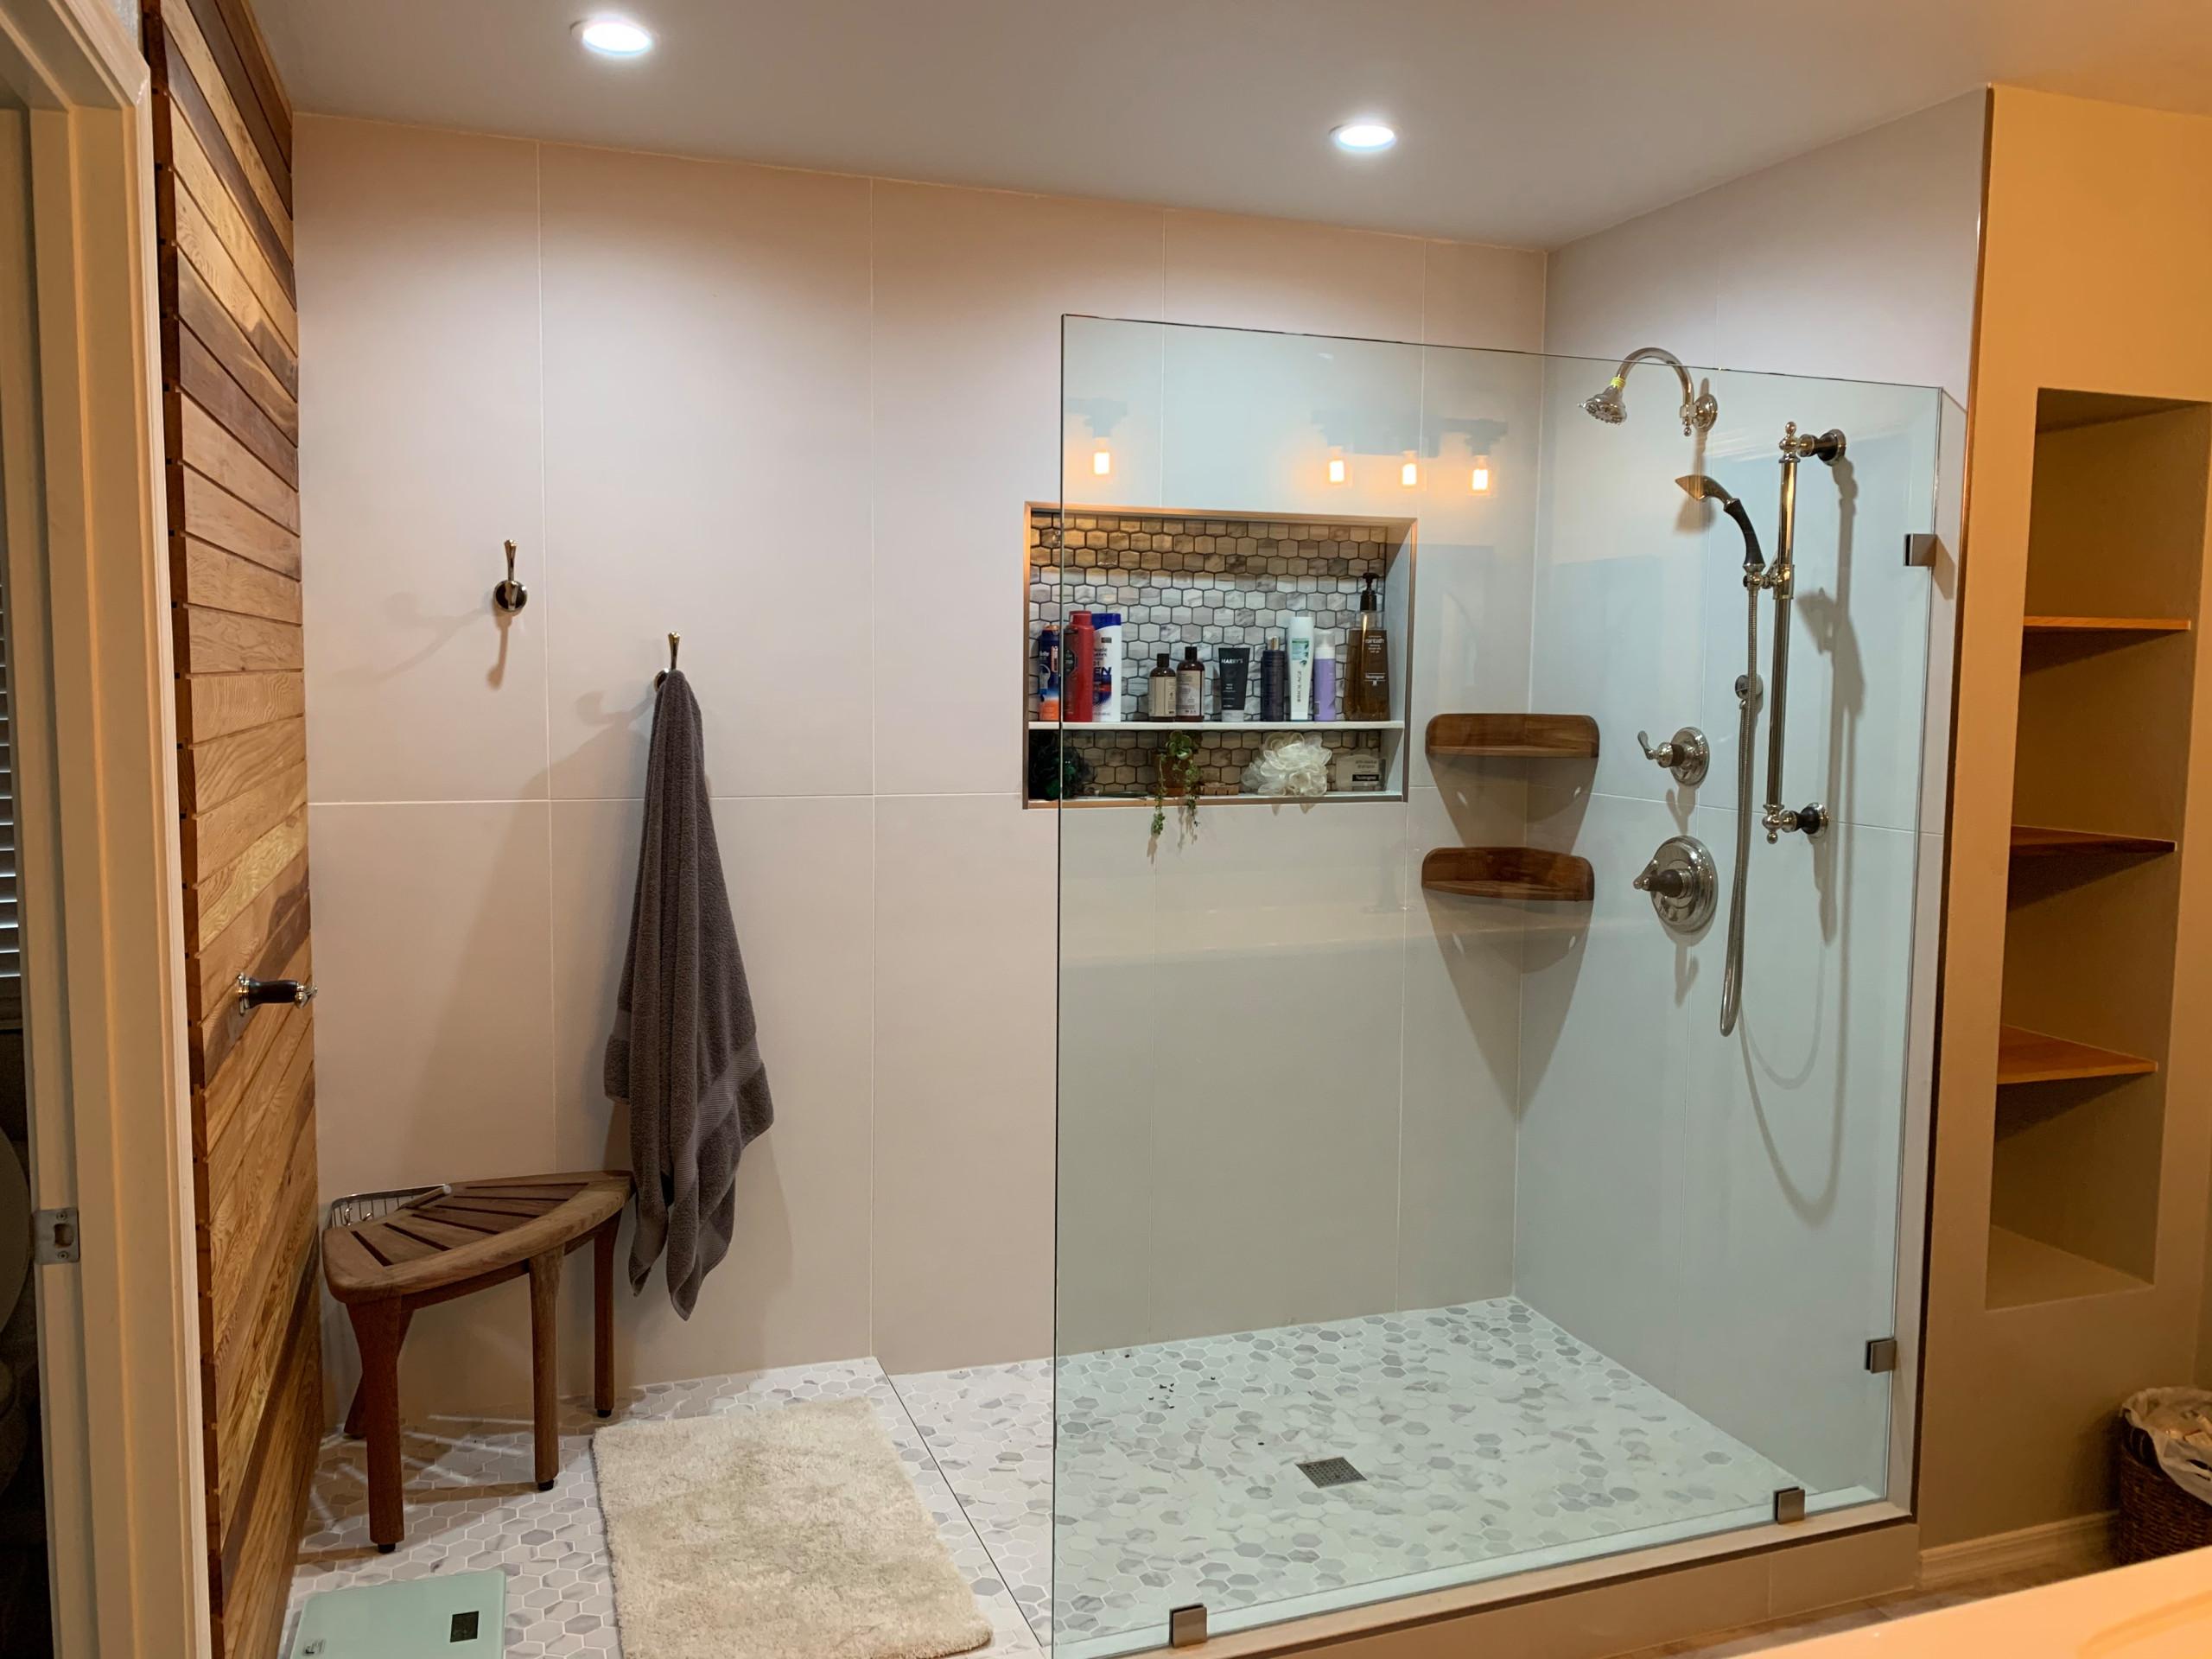 Condo master bath